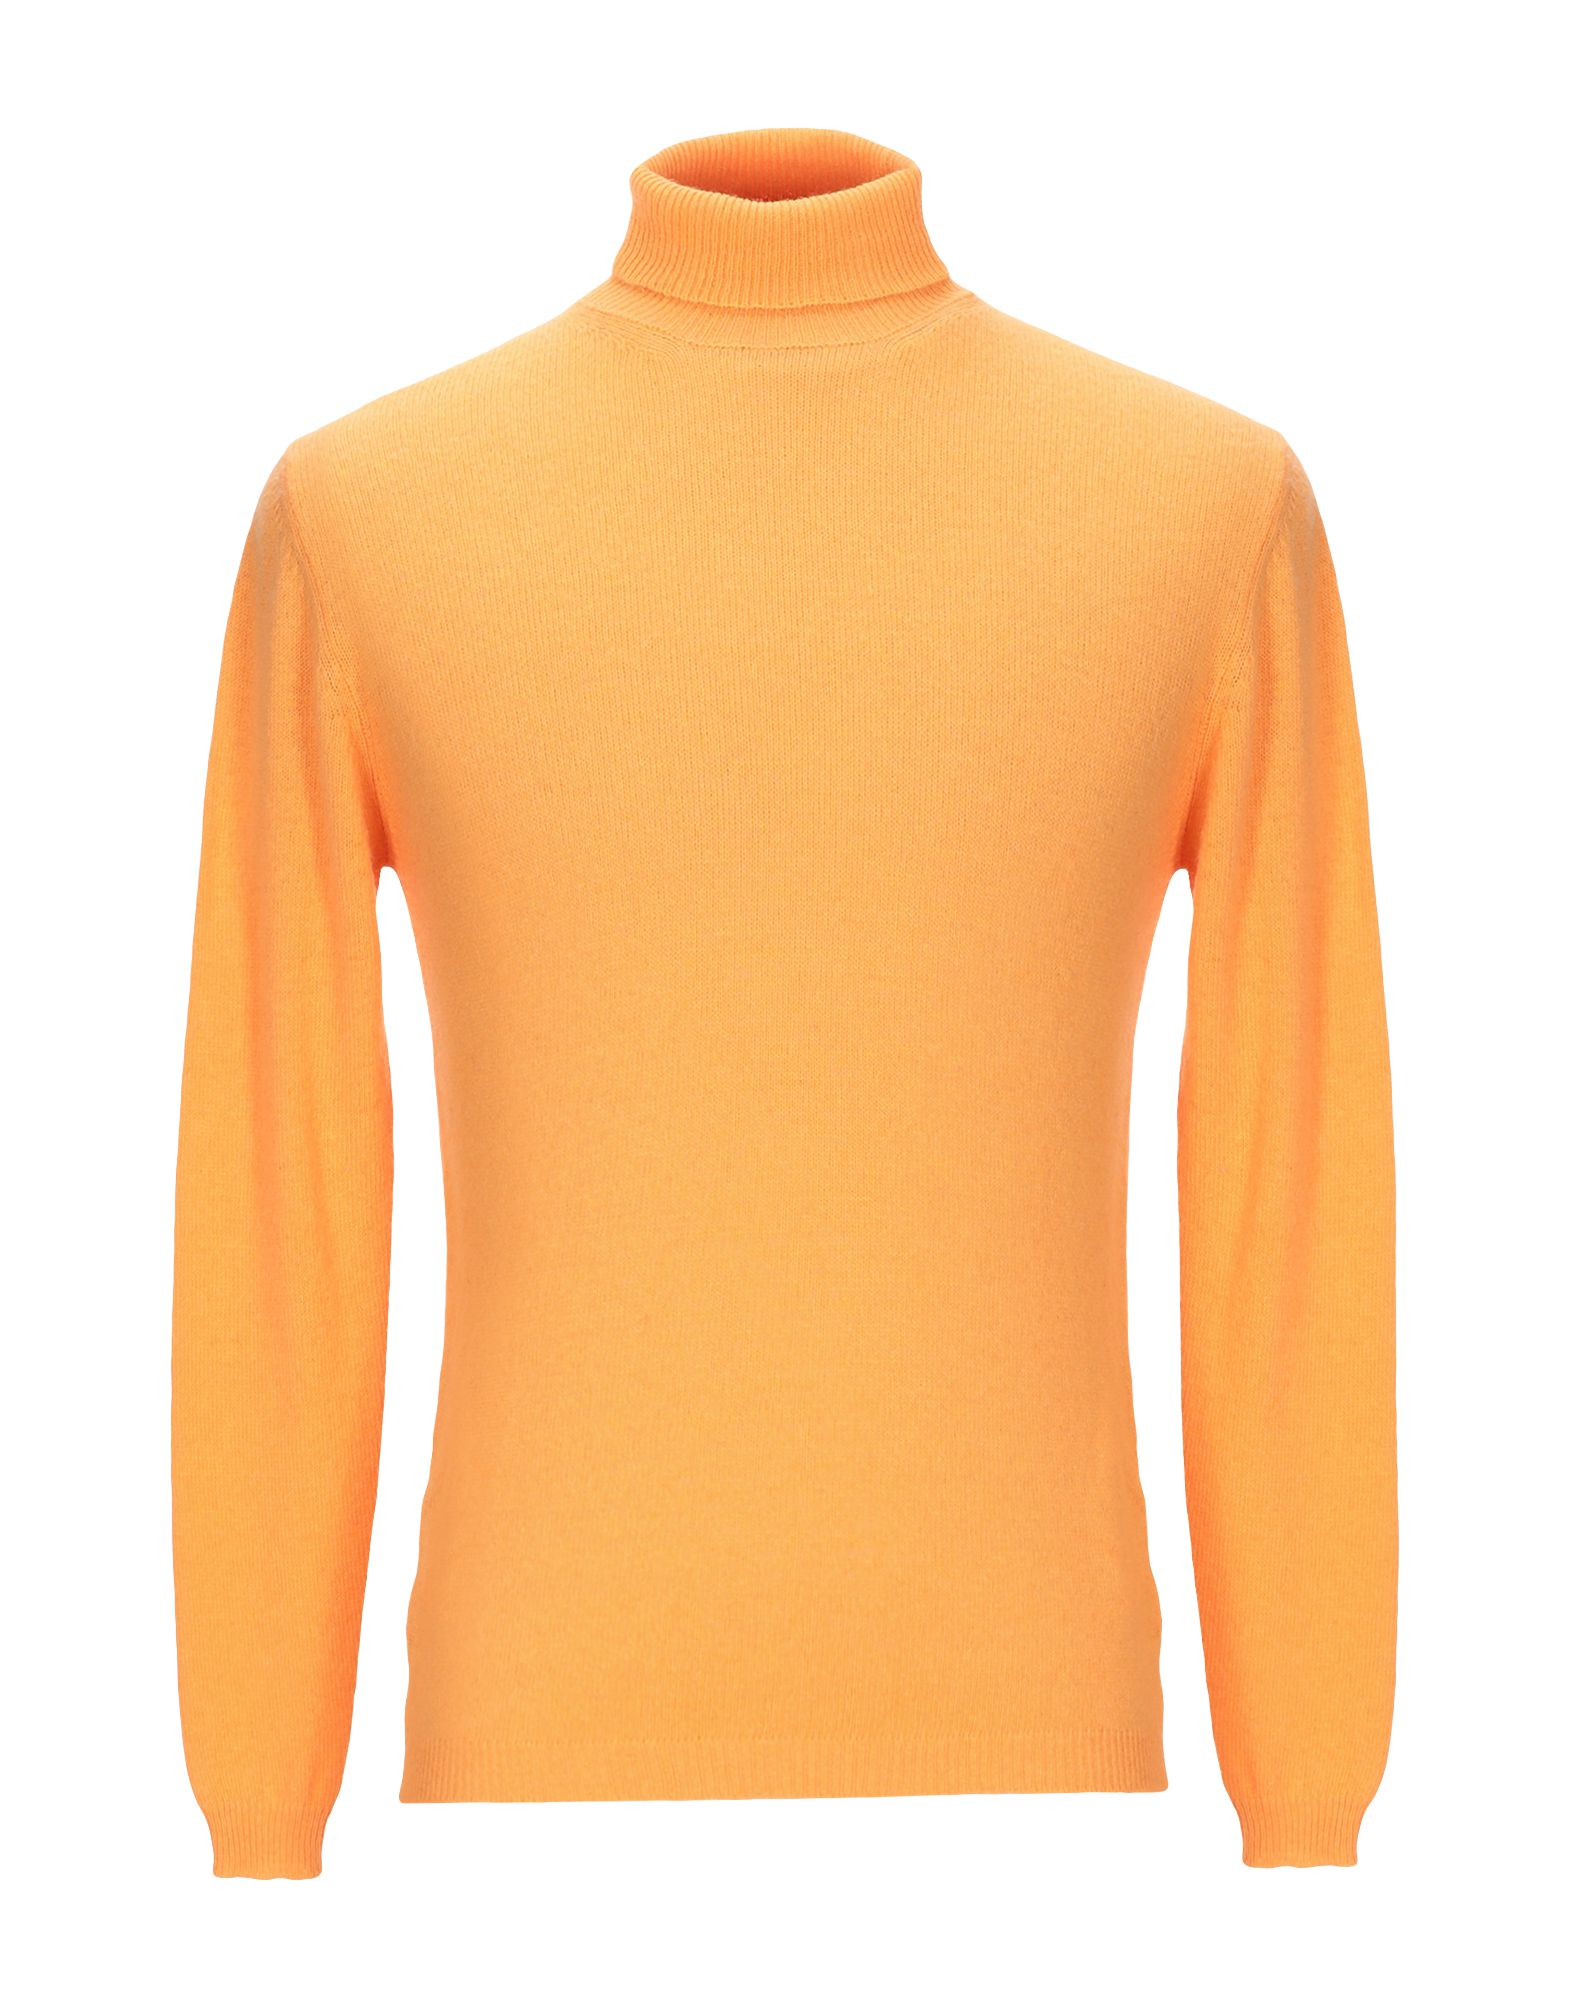 OBVIOUS BASIC Водолазки костюм ширли gt basic